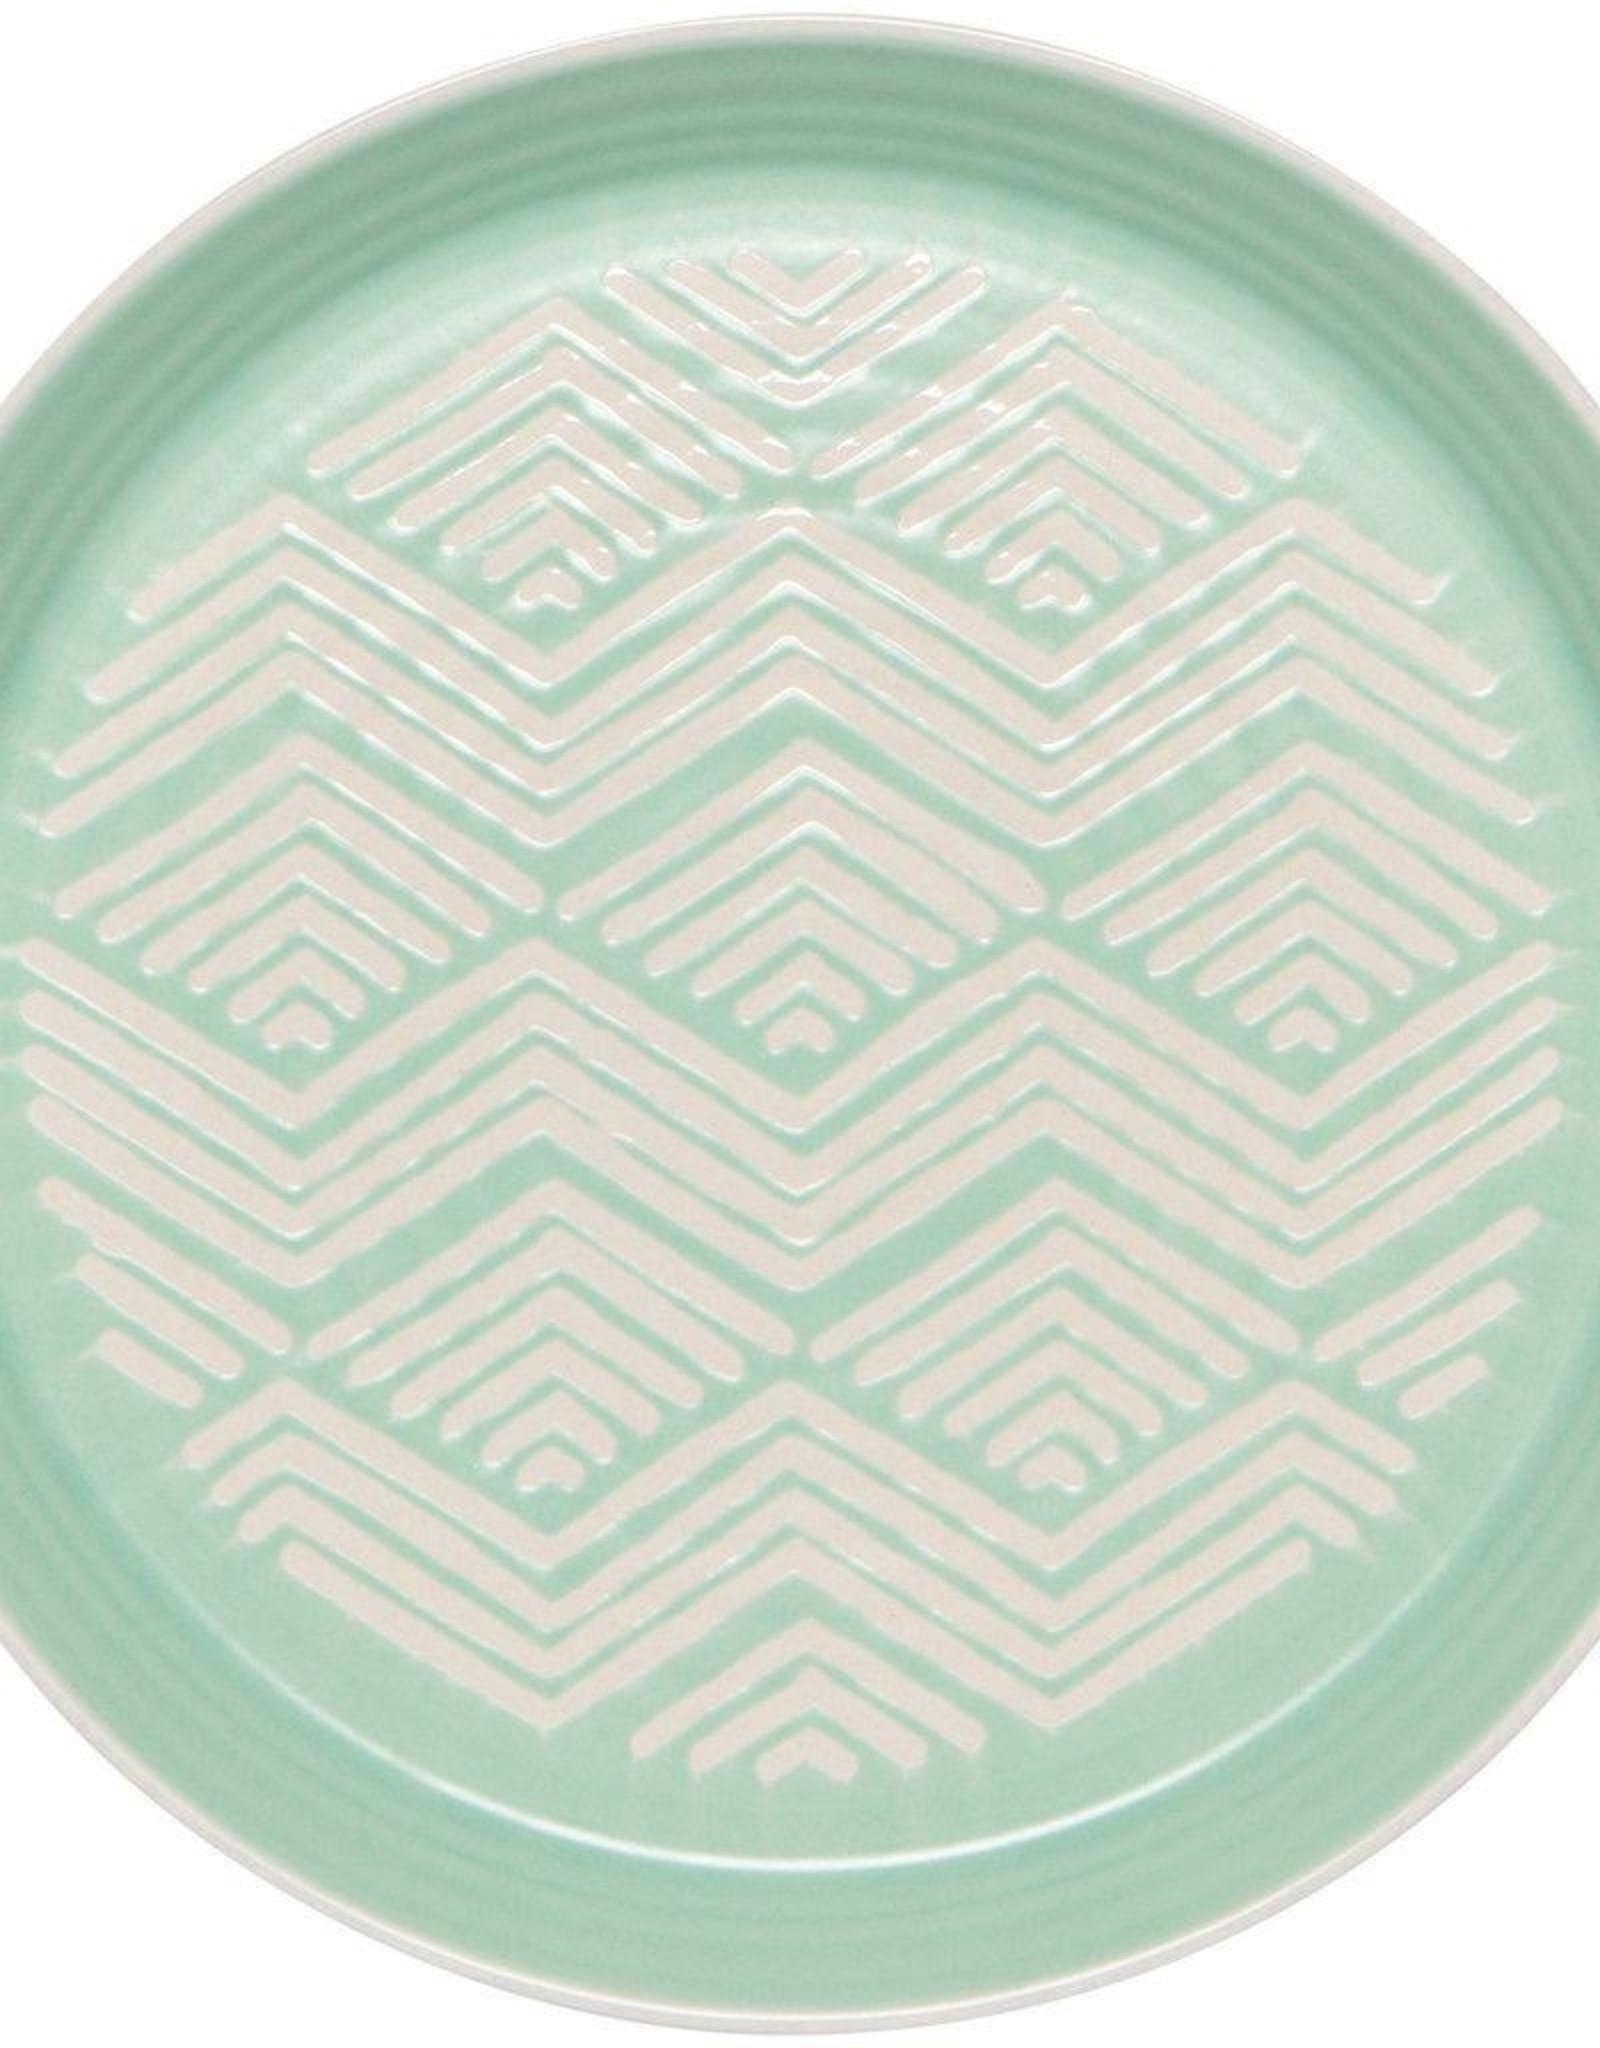 Danica Danica Imprint Side Plate-Mint